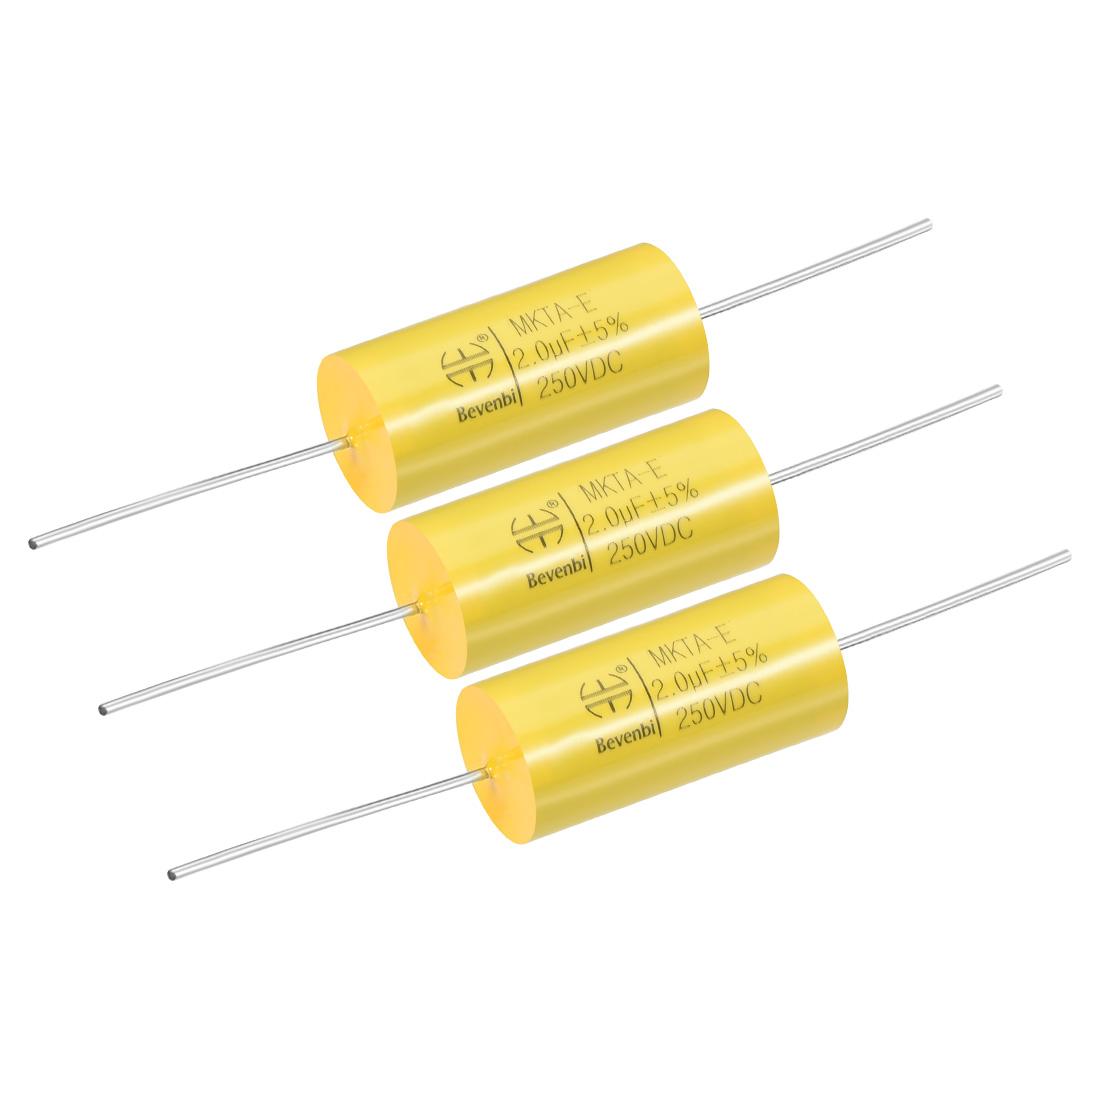 Film Capacitor 250V DC 2.0uF MKTA-E Round Polypropylene Capacitors Yellow 3pcs